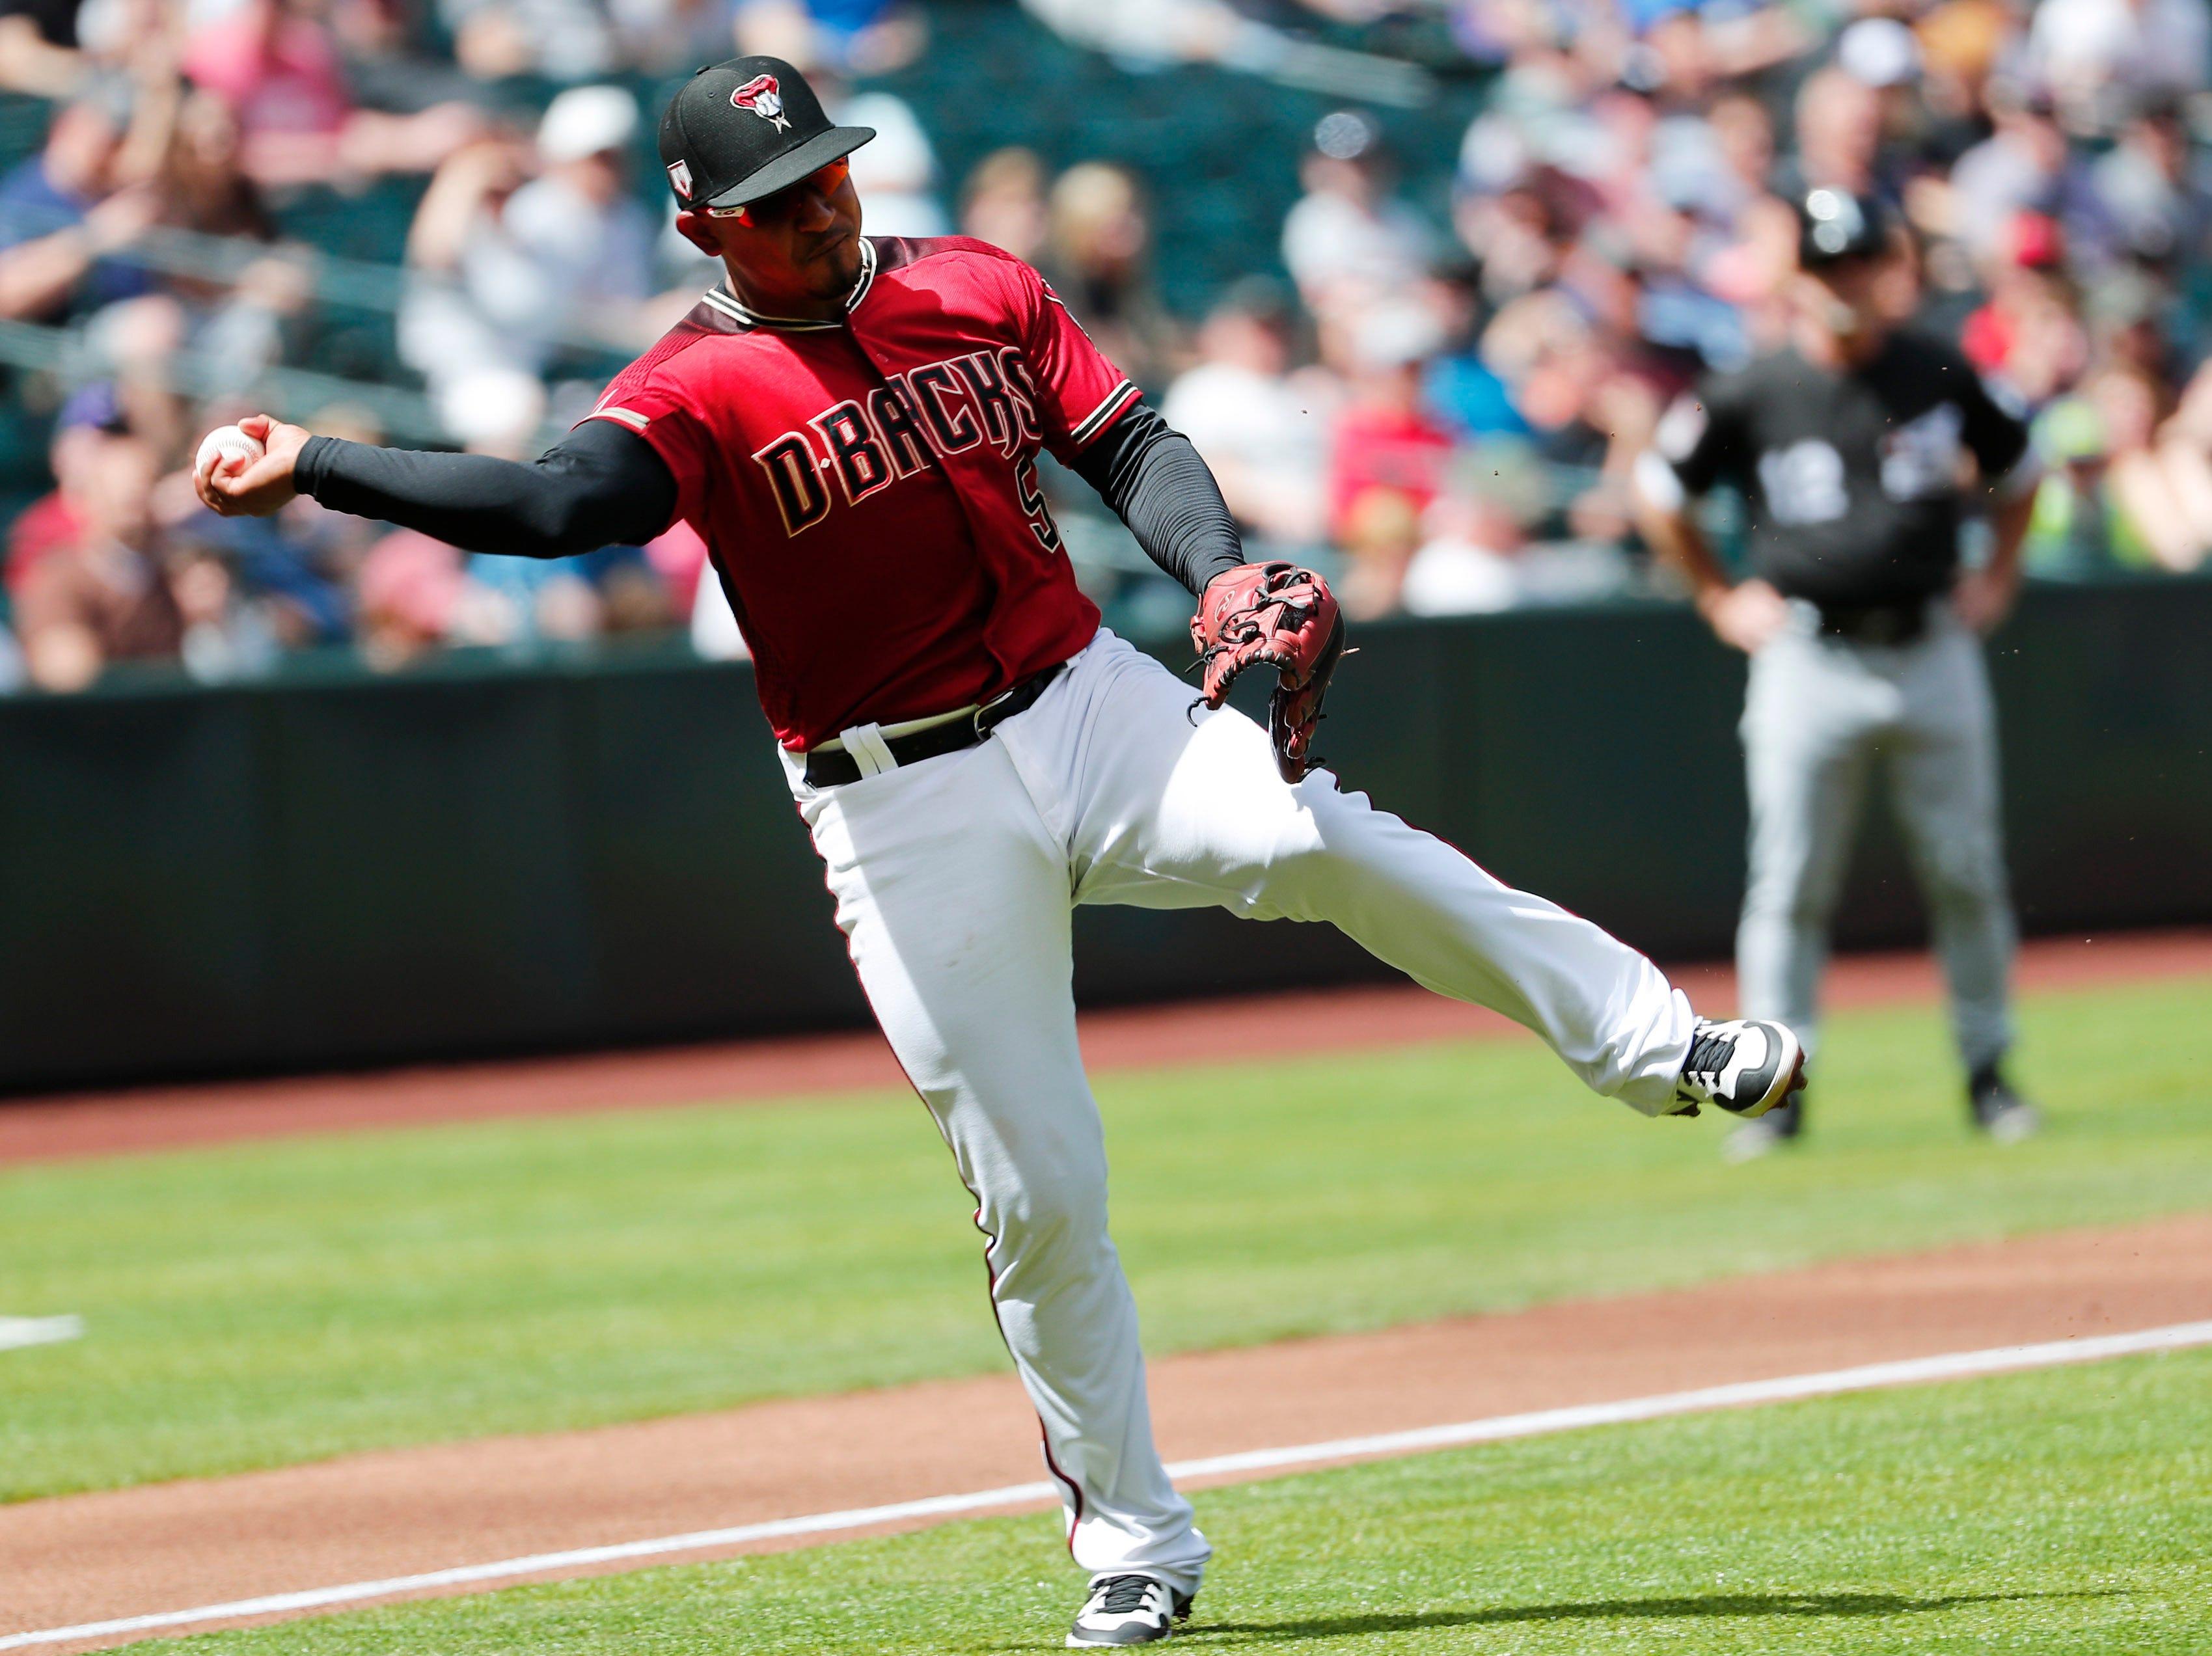 Arizona Diamondbacks third baseman Eduardo Escobar (5) throws out Chicago White Sox third baseman Yolmer Sanchez (5) on a bunt attempt during spring training action at Chase Field March 26, 2019.